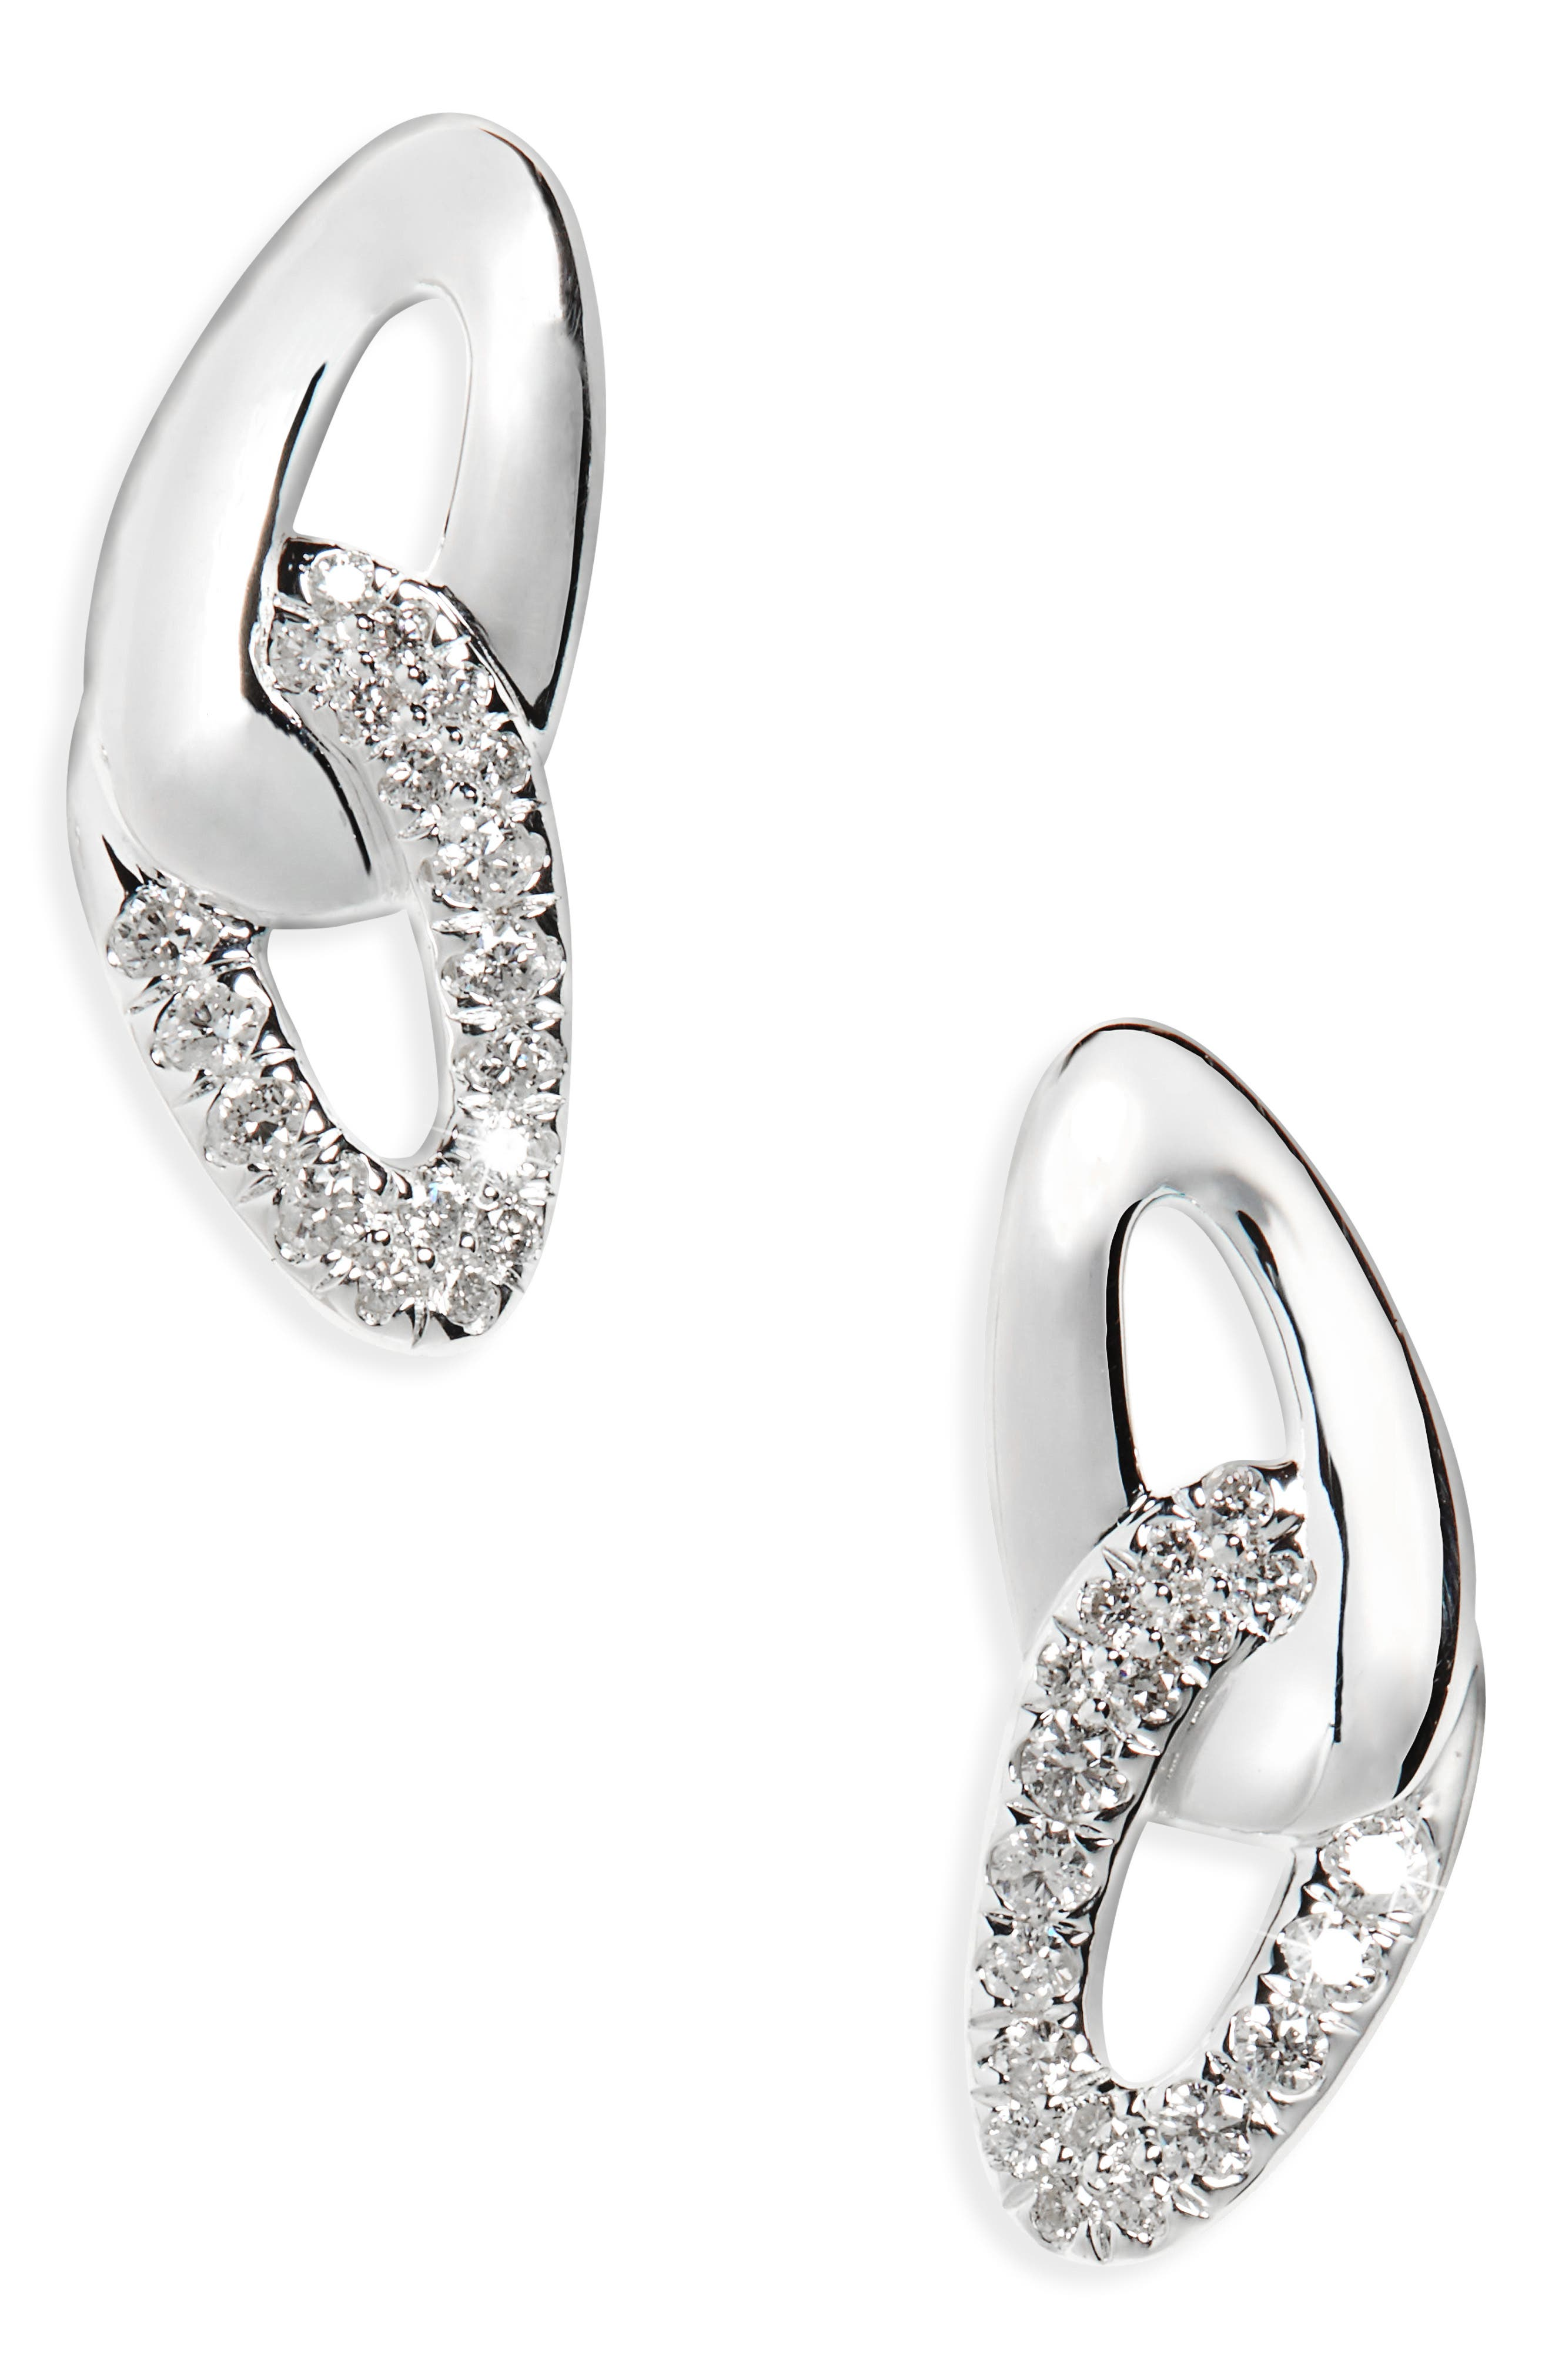 Cherish Link Diamond Stud Earrings,                         Main,                         color, 040